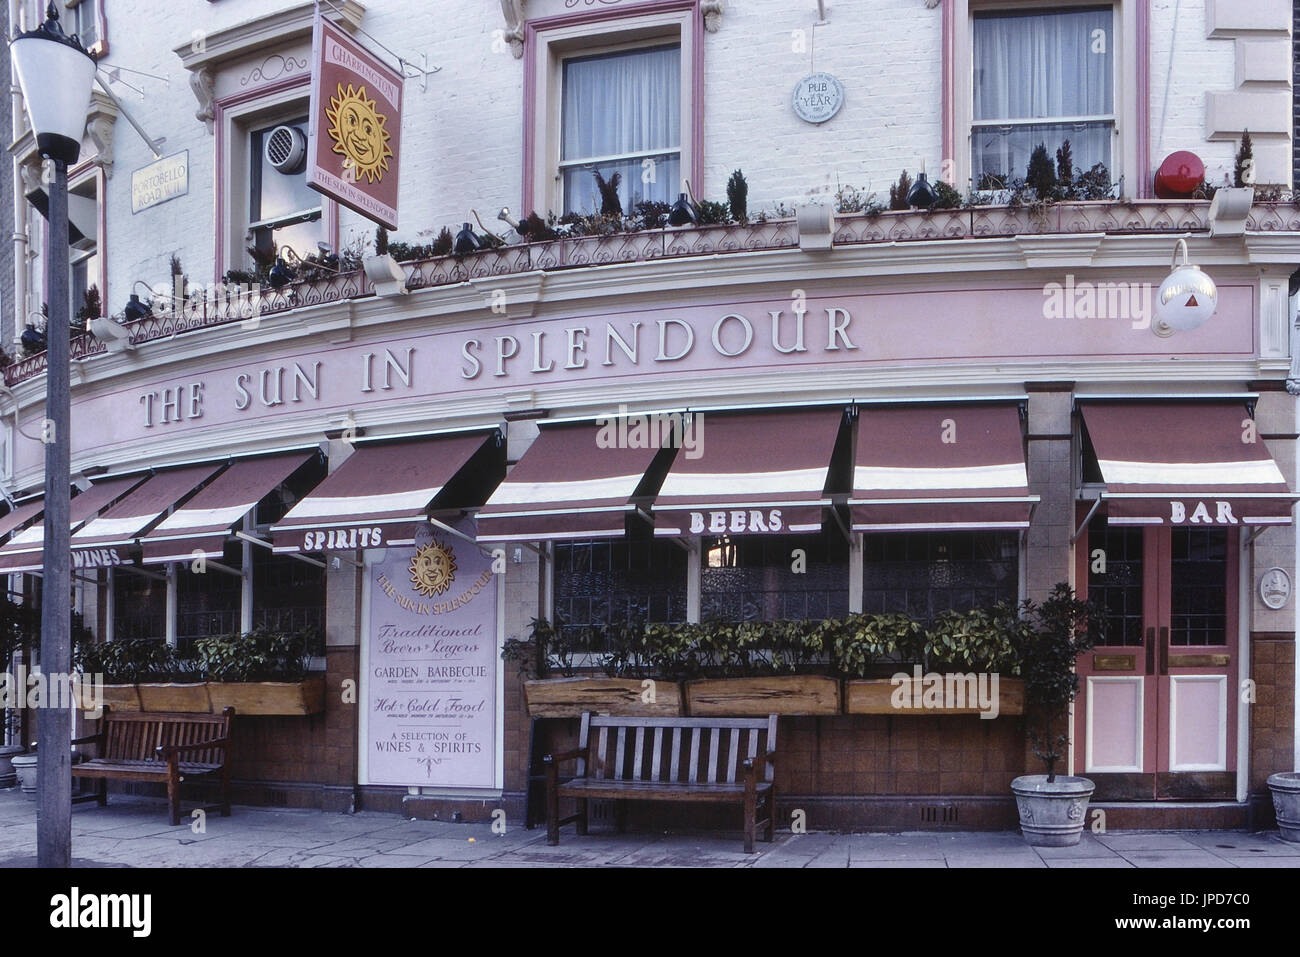 The Sun in Splendour pub, Notting Hill, London, England, UK, Circa 1980's - Stock Image